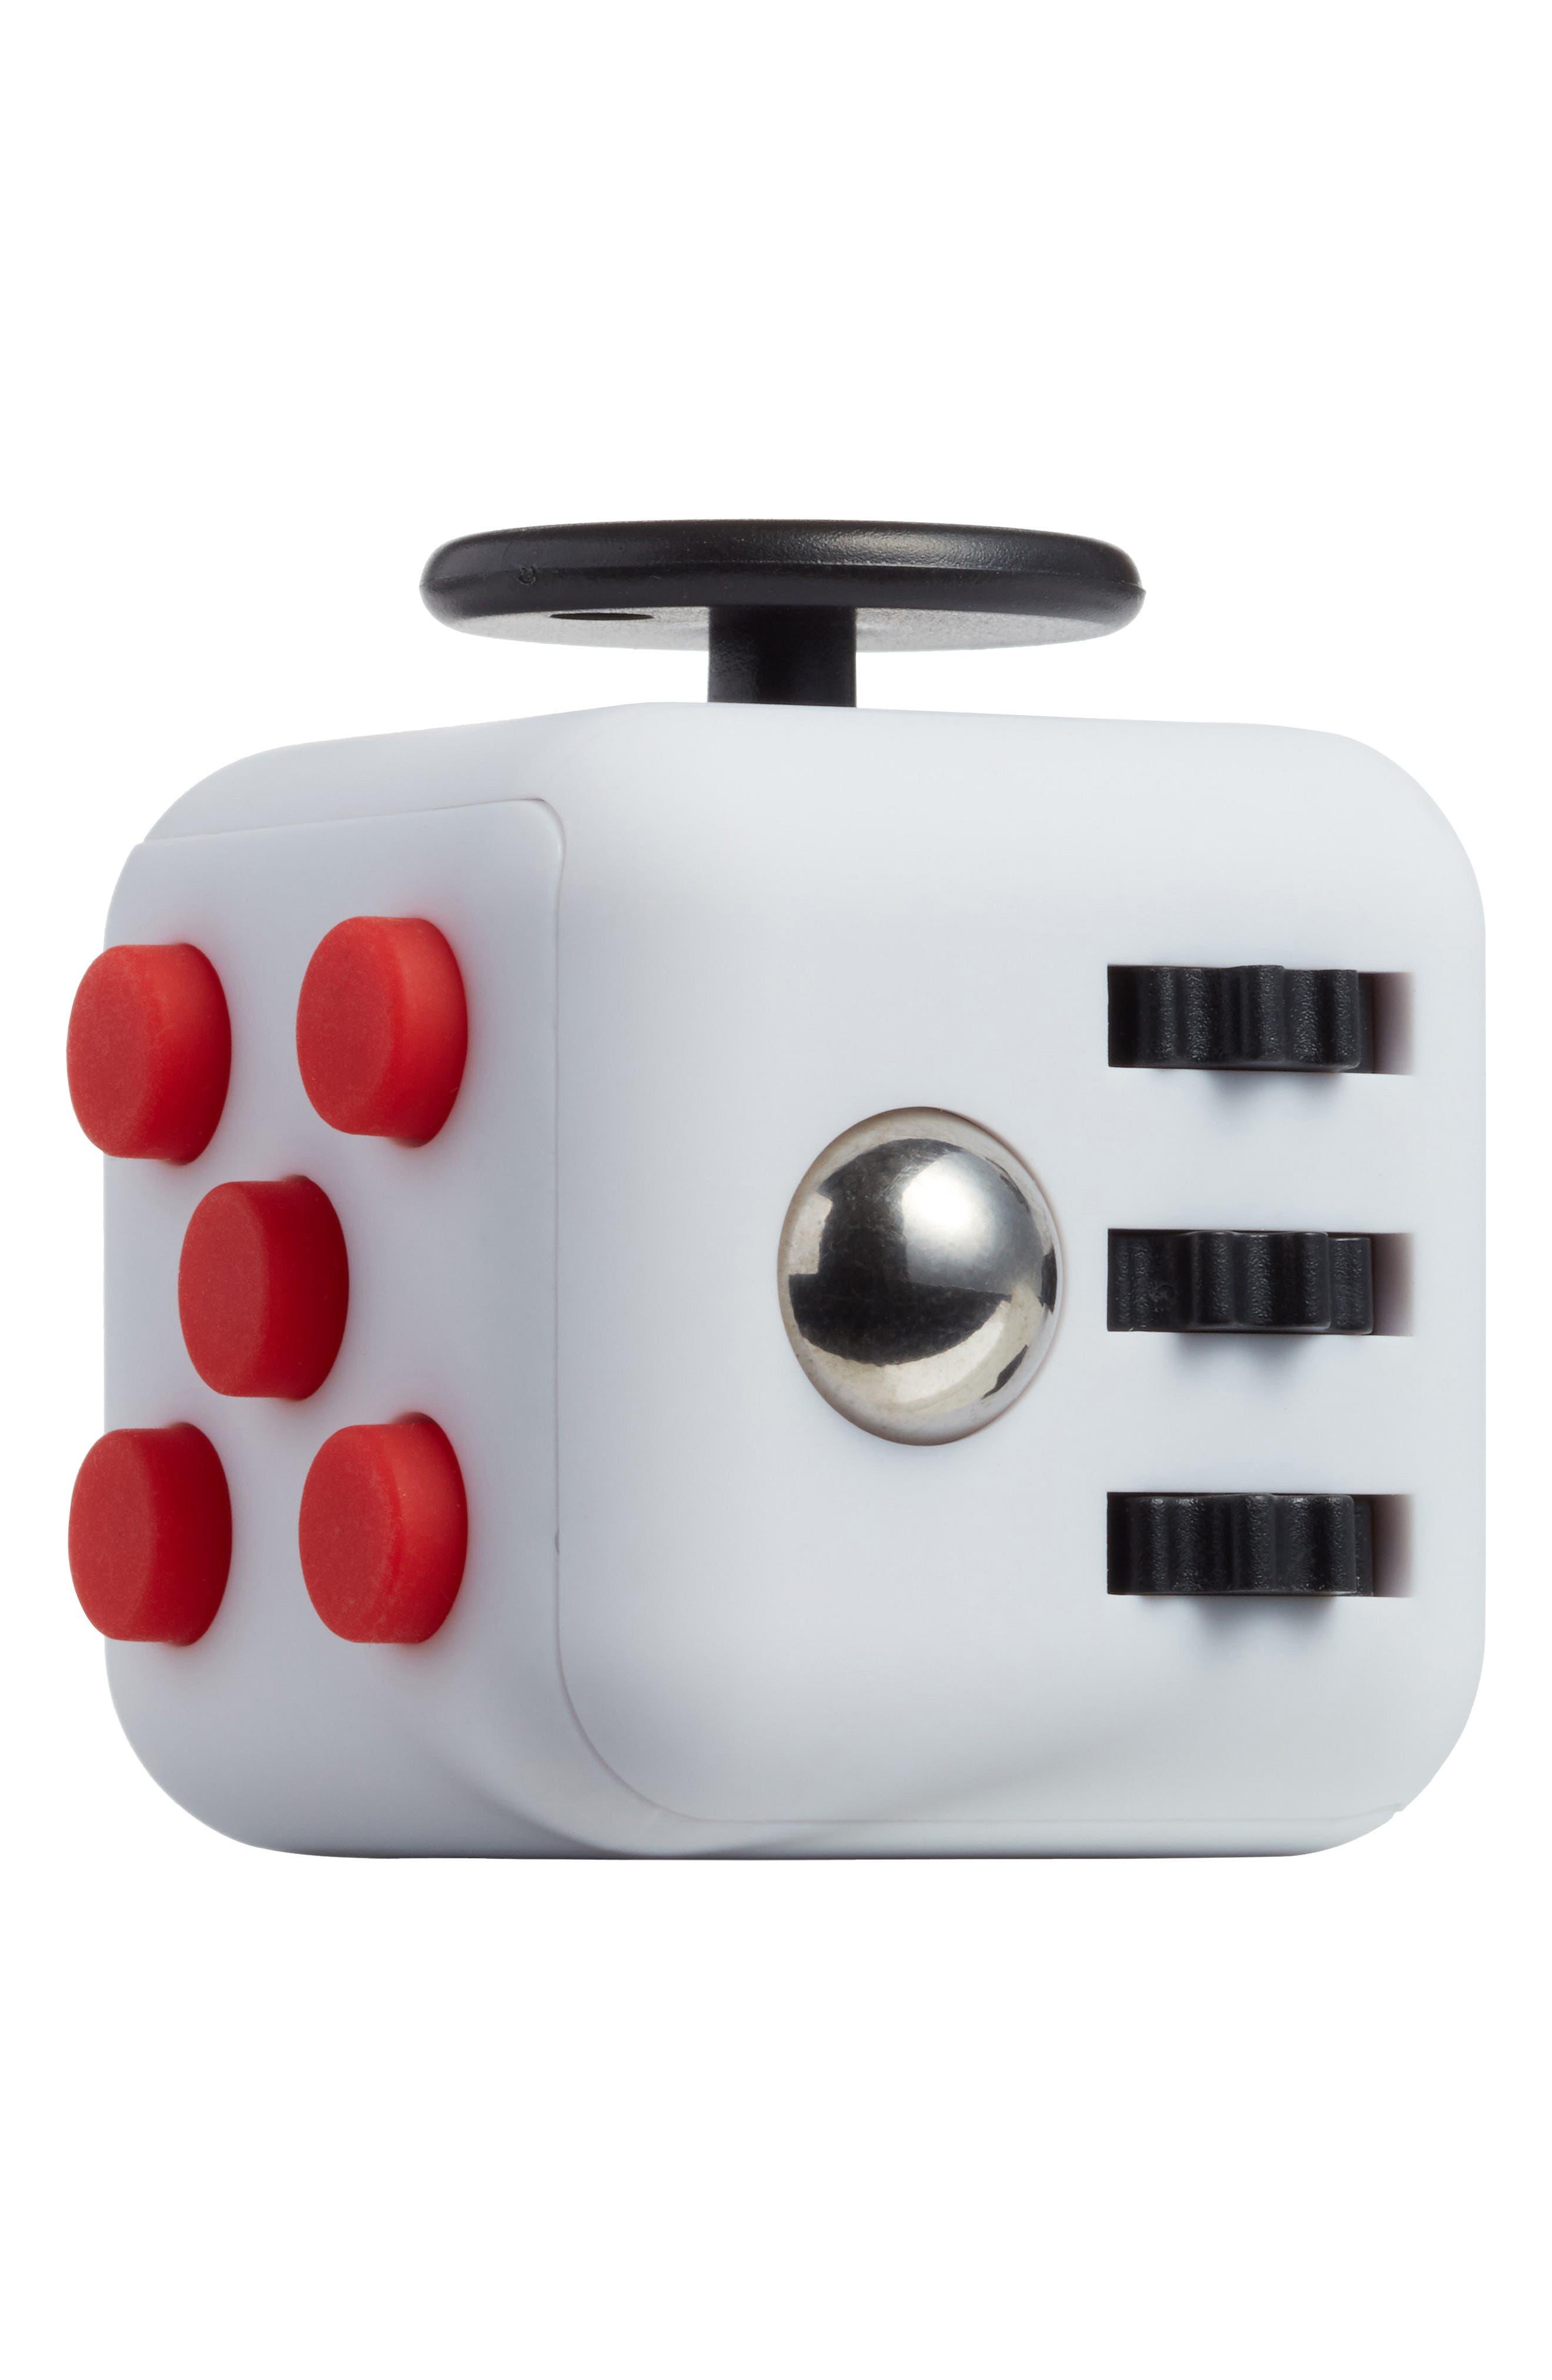 Addictive Fidget Spinners Fidget Stress Cube